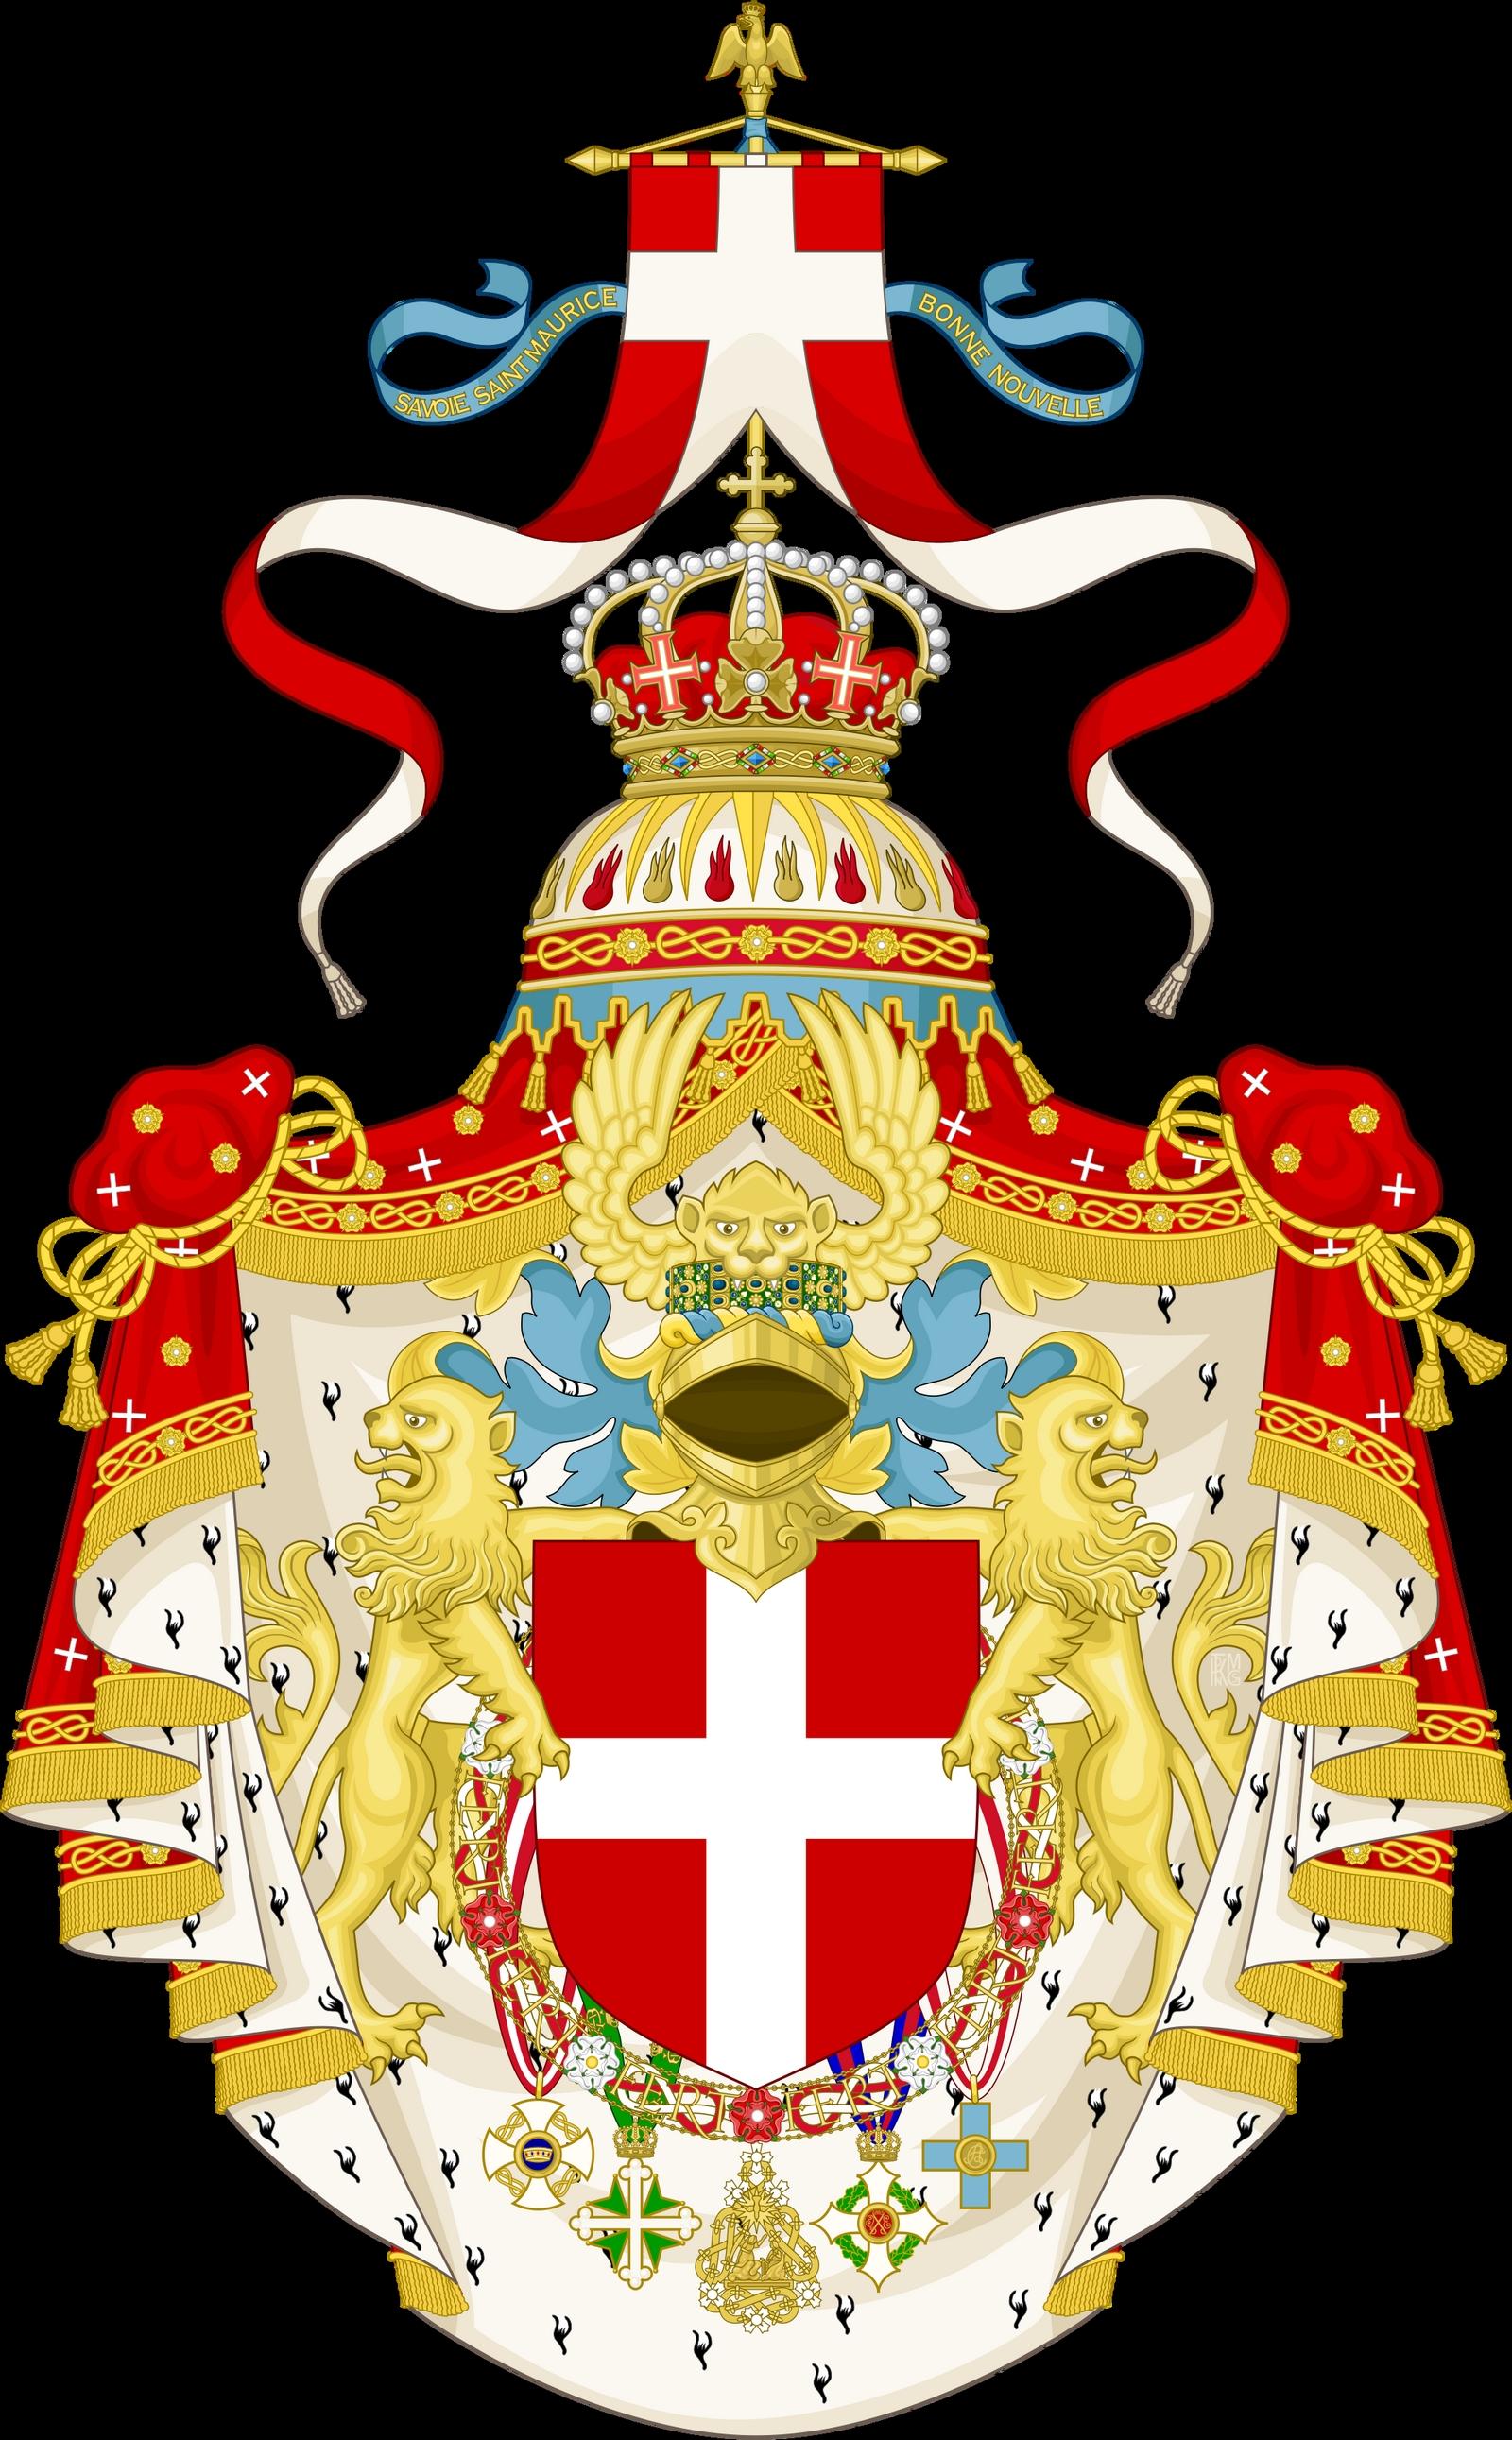 50b9ea6a16f37 La Profecía del Padre Pío sobre el Futuro Rey de Italia » Foros de ...